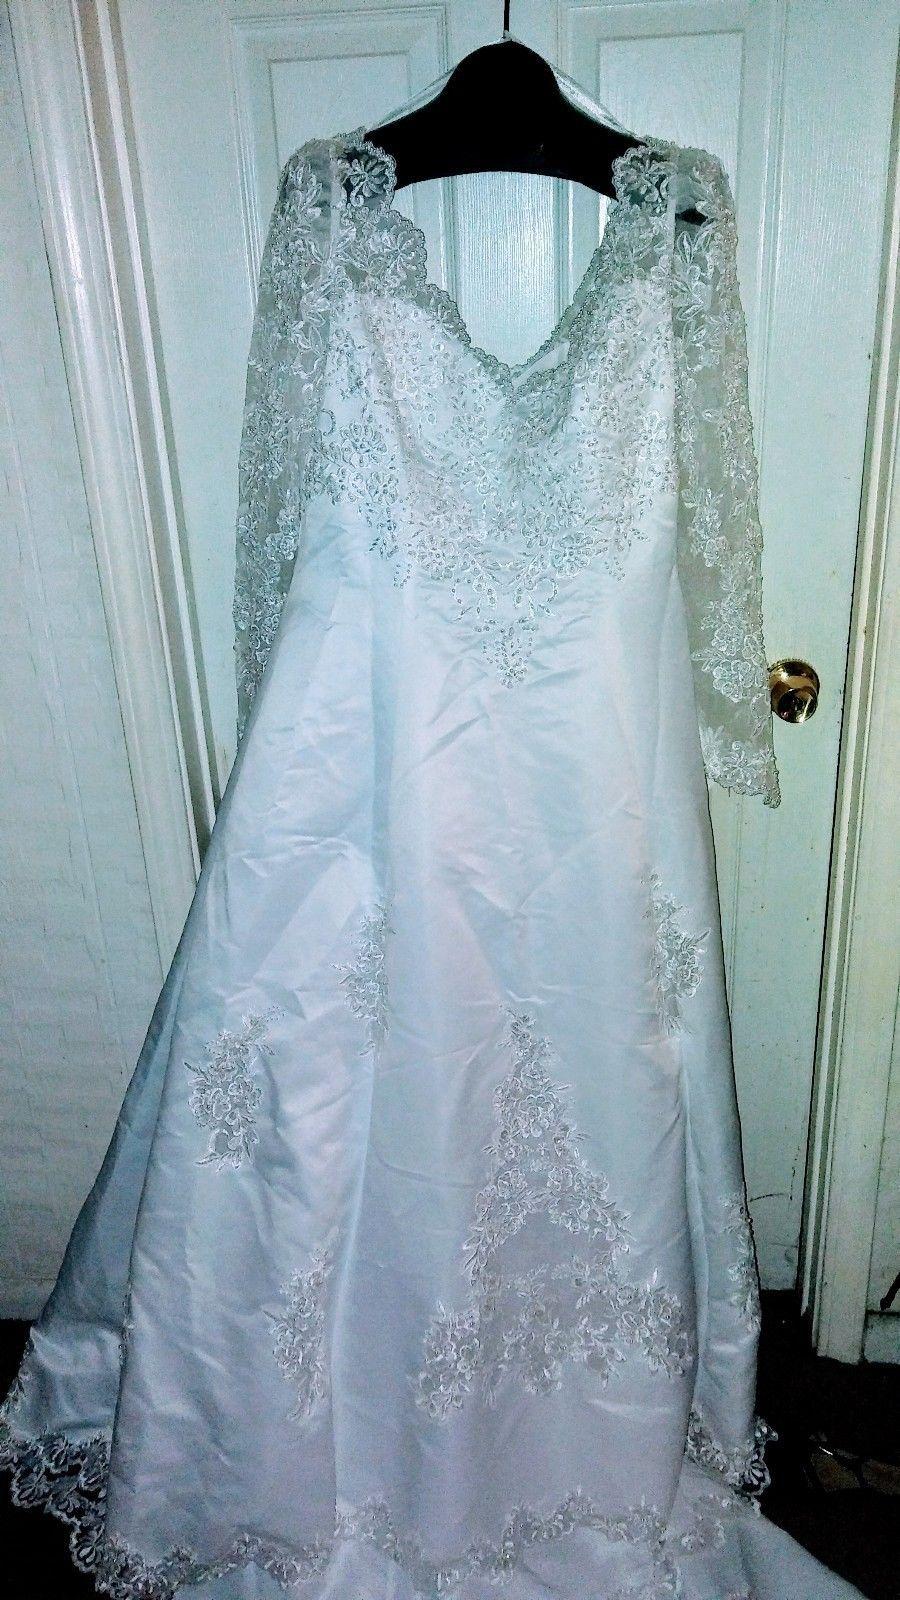 White michaelangelo wedding dress | Wedding dress accessories ...